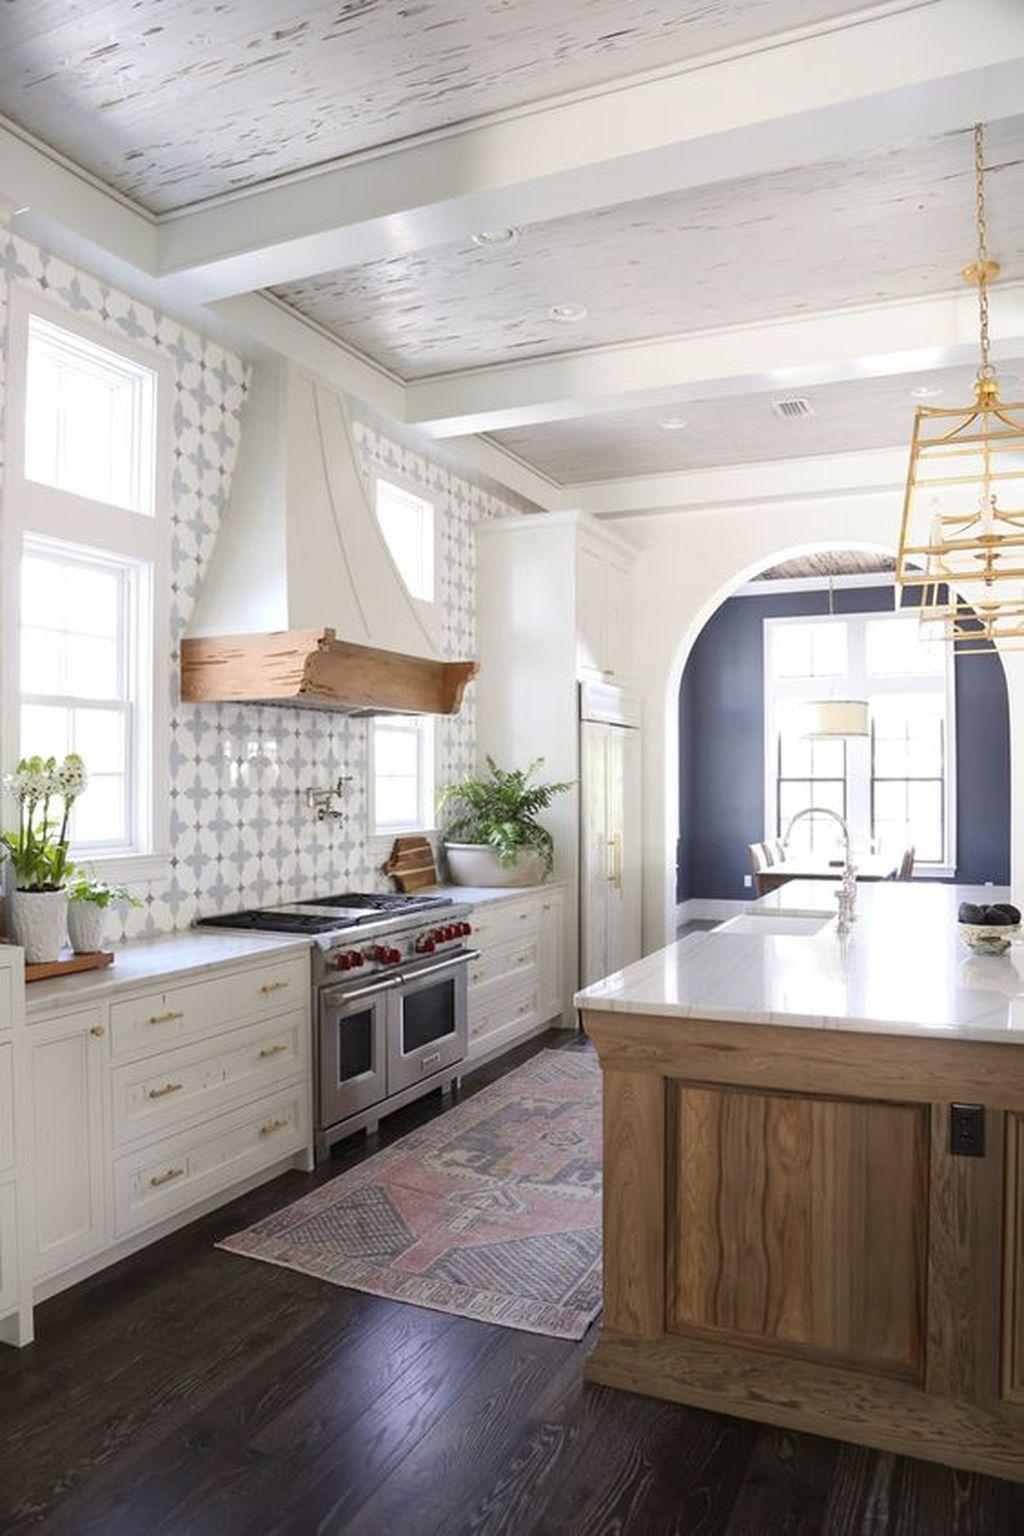 40 Popular Modern Farmhouse Kitchen Backsplash Ideas | Pinterest ...